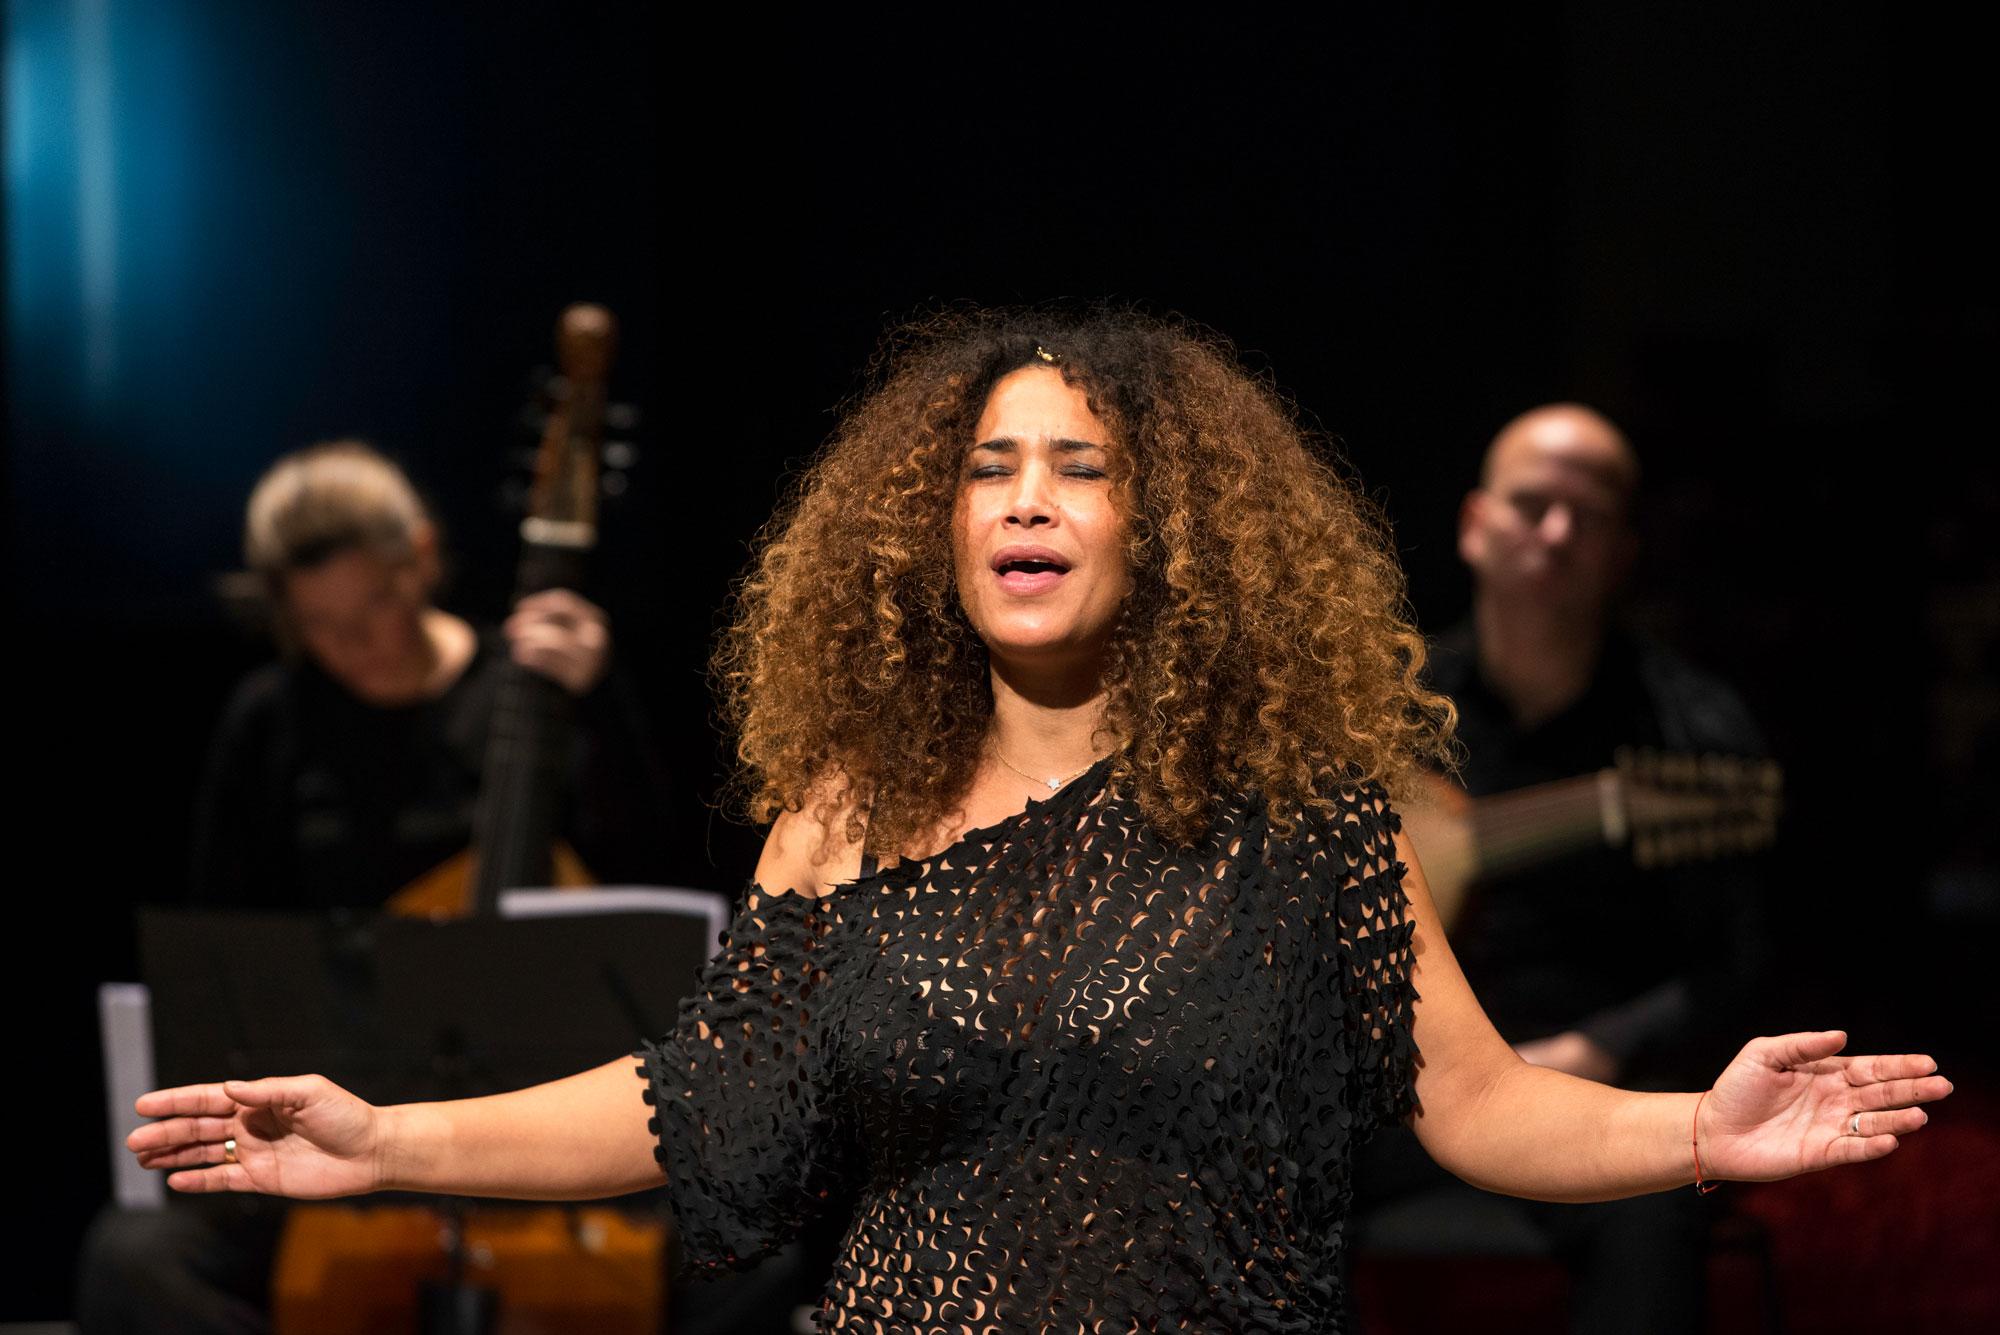 Ghalia Benali dans L'Allégorie du désir par Zefiro Torna / Vocalconsort Berlin / Ghalia Benali